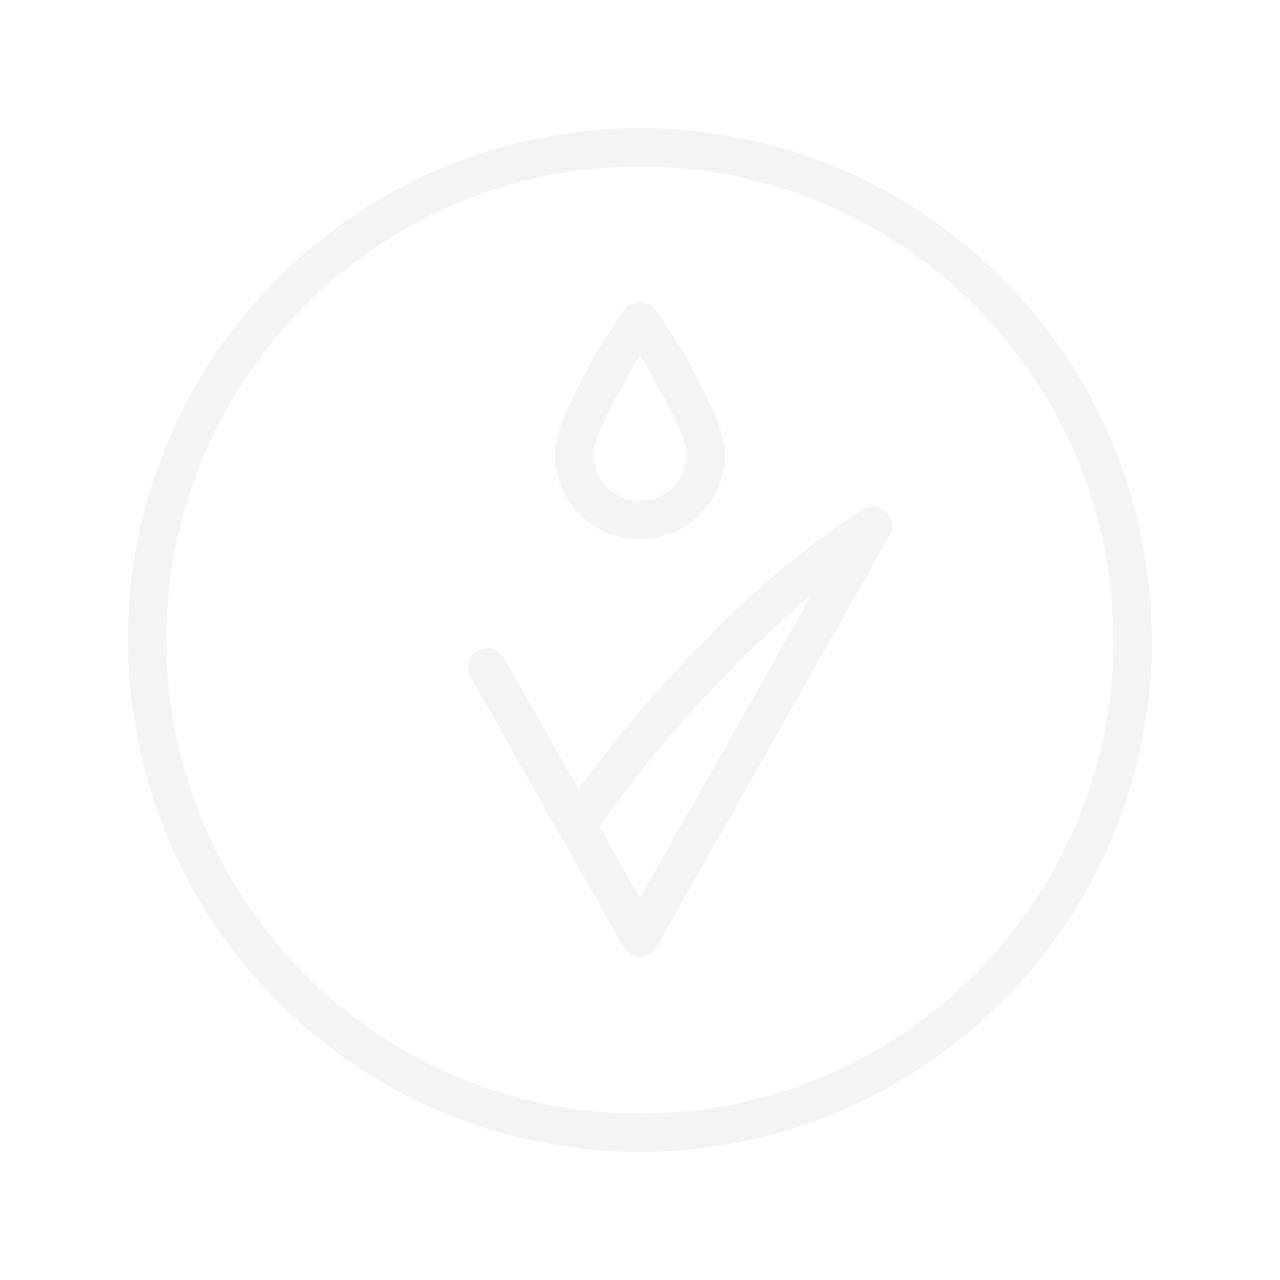 NANSHY Buffed Base R01 Brush White